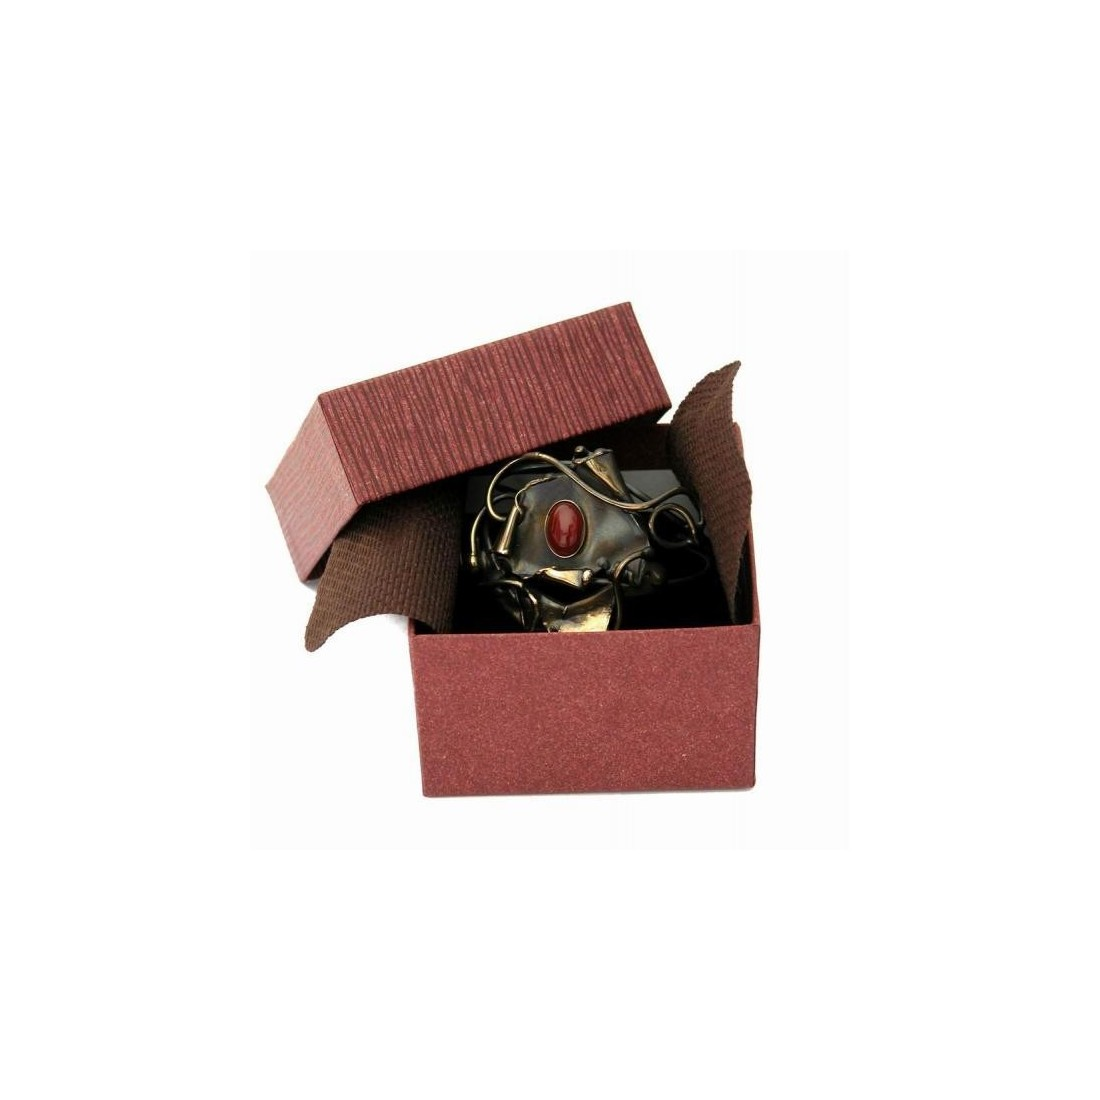 Boite cadeau pour bracelet rigide